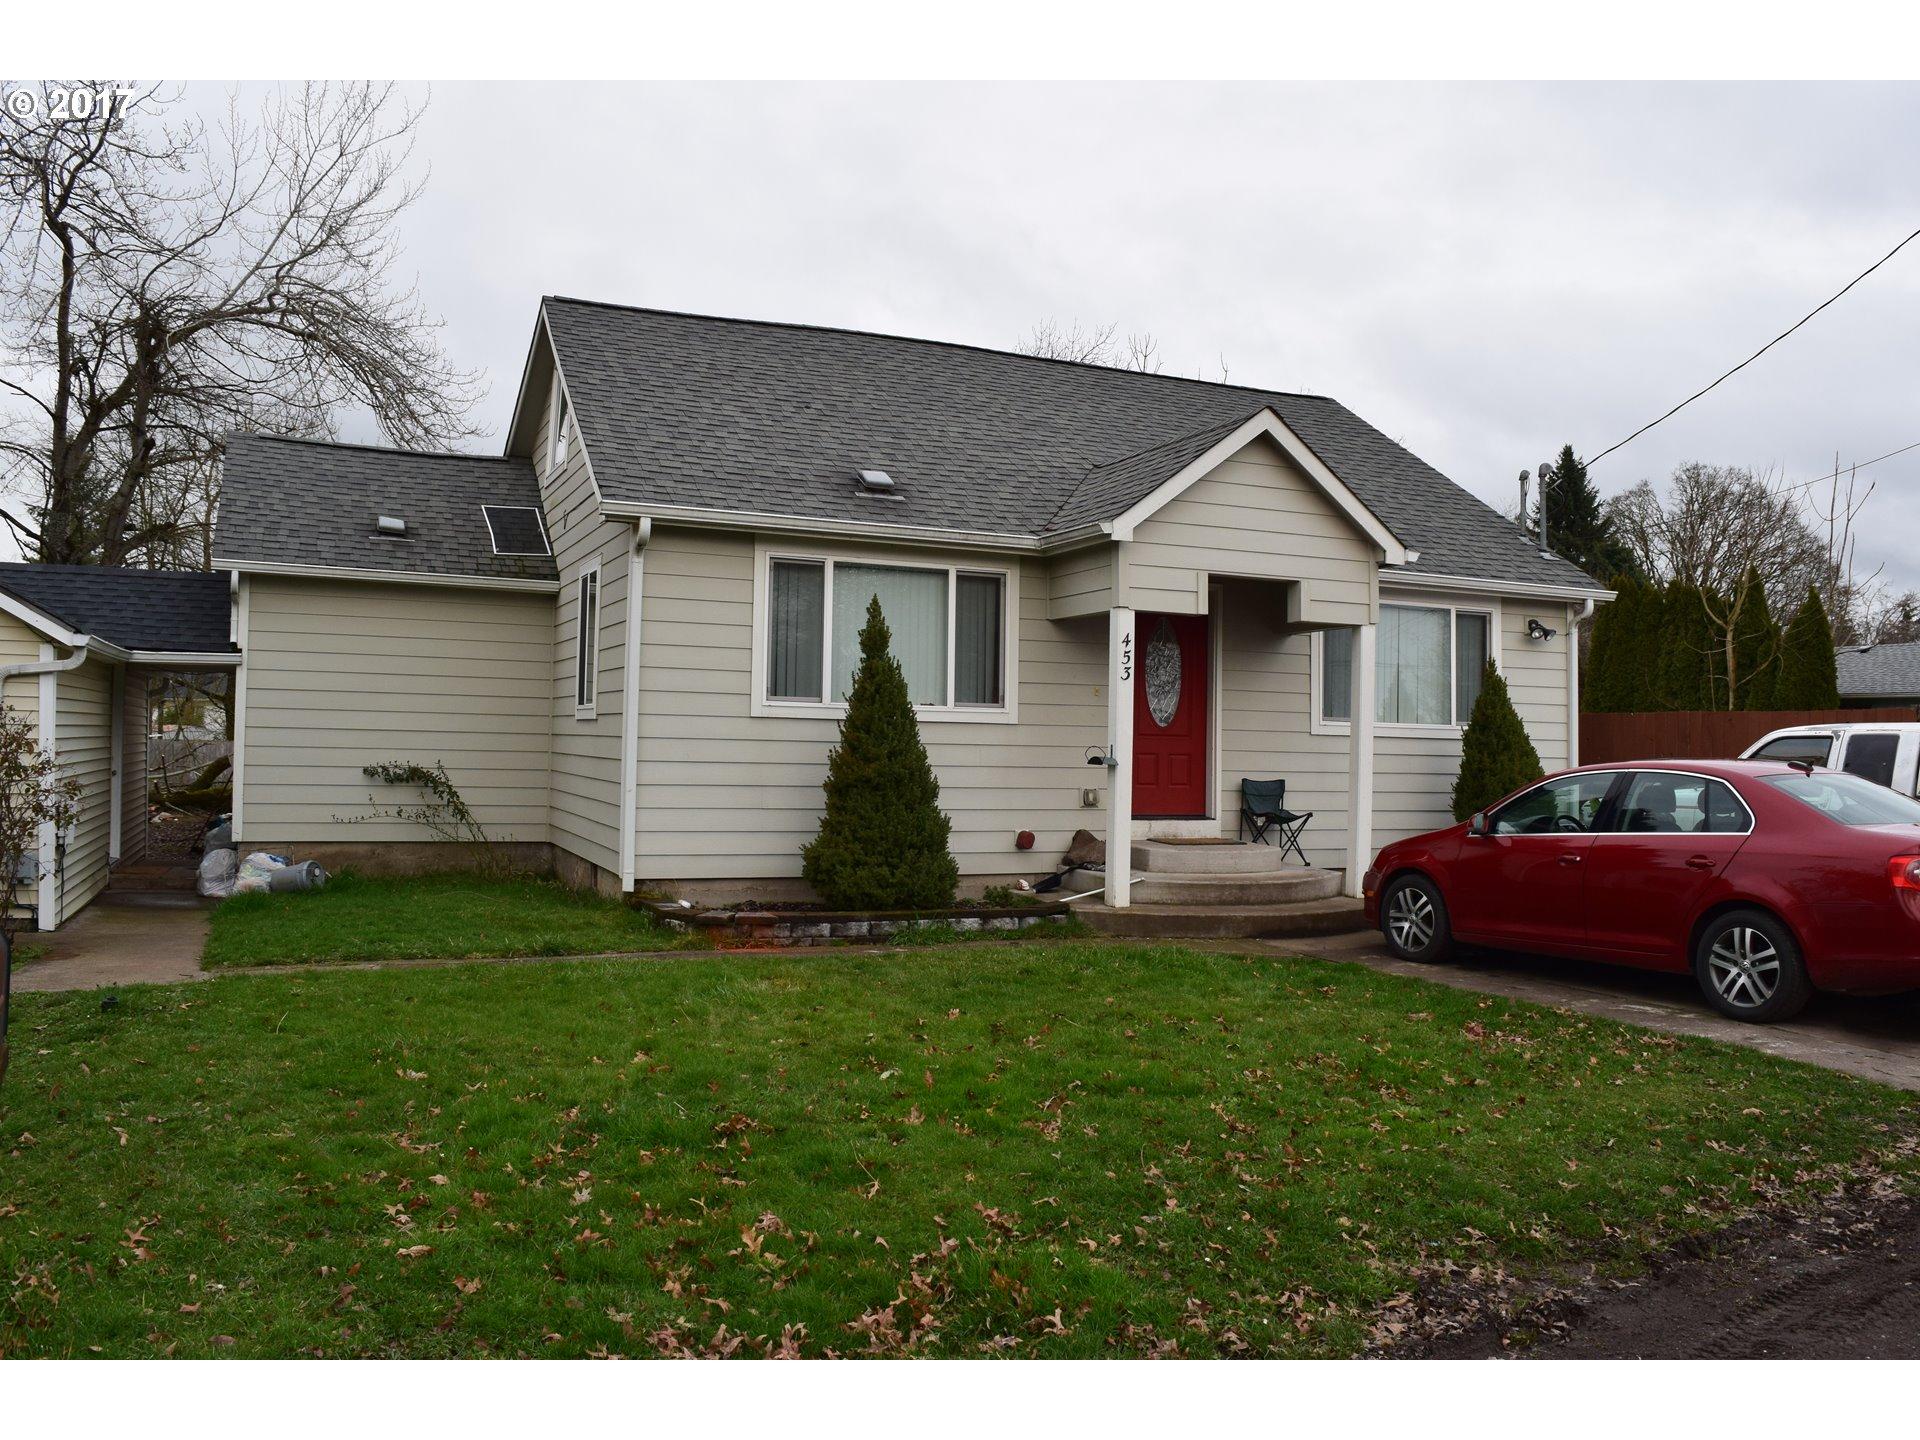 453 WILKIE ST, Eugene, OR 97402